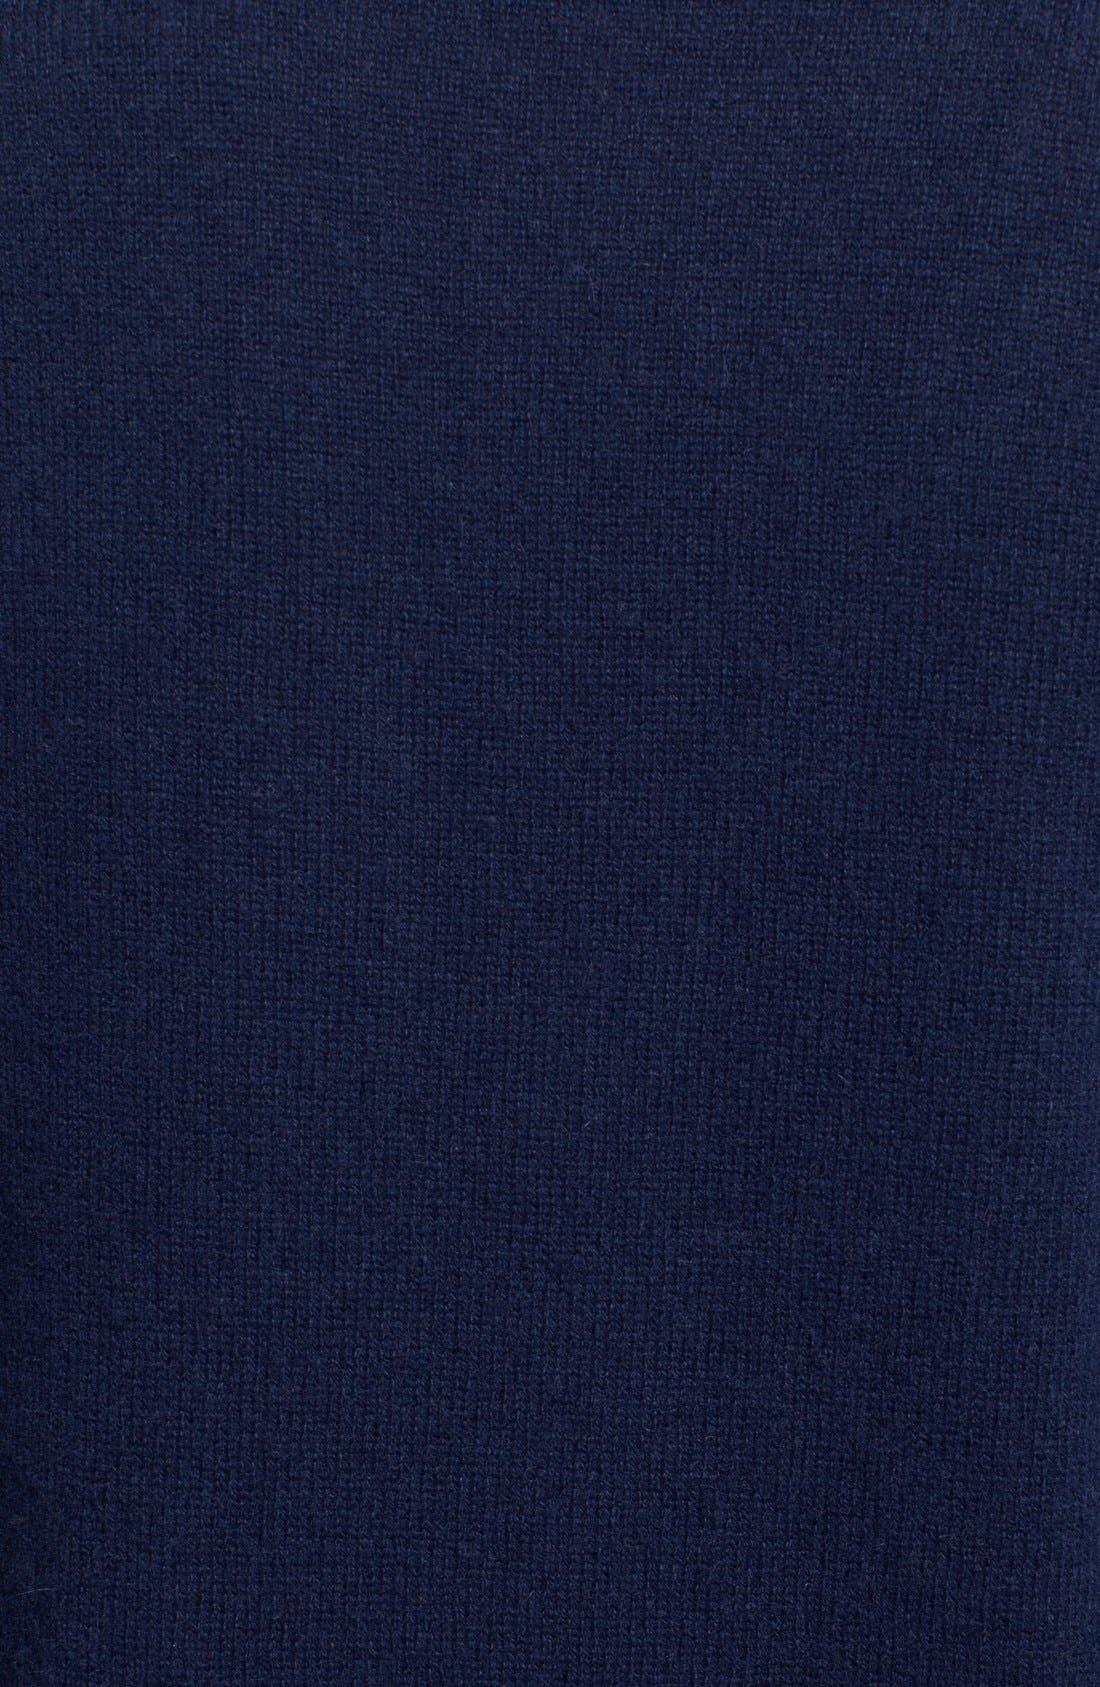 'Asher' V-Neck Cashmere Sweater,                             Alternate thumbnail 3, color,                             404